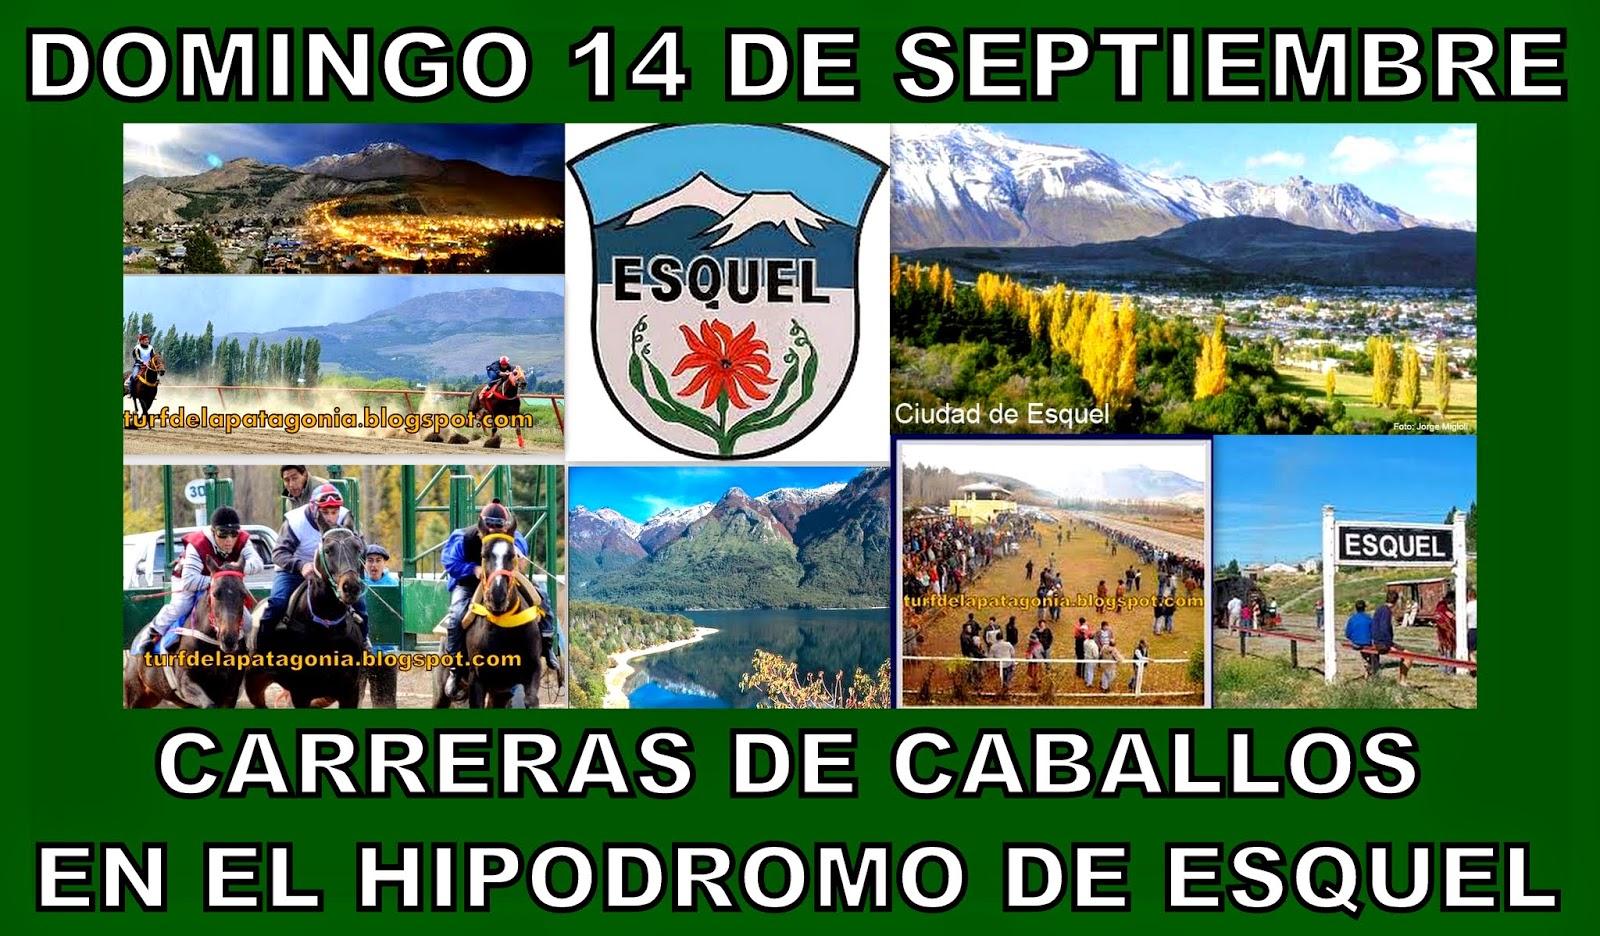 http://turfdelapatagonia.blogspot.com.ar/2014/08/1409-carreras-de-caballos-en-esquel.html